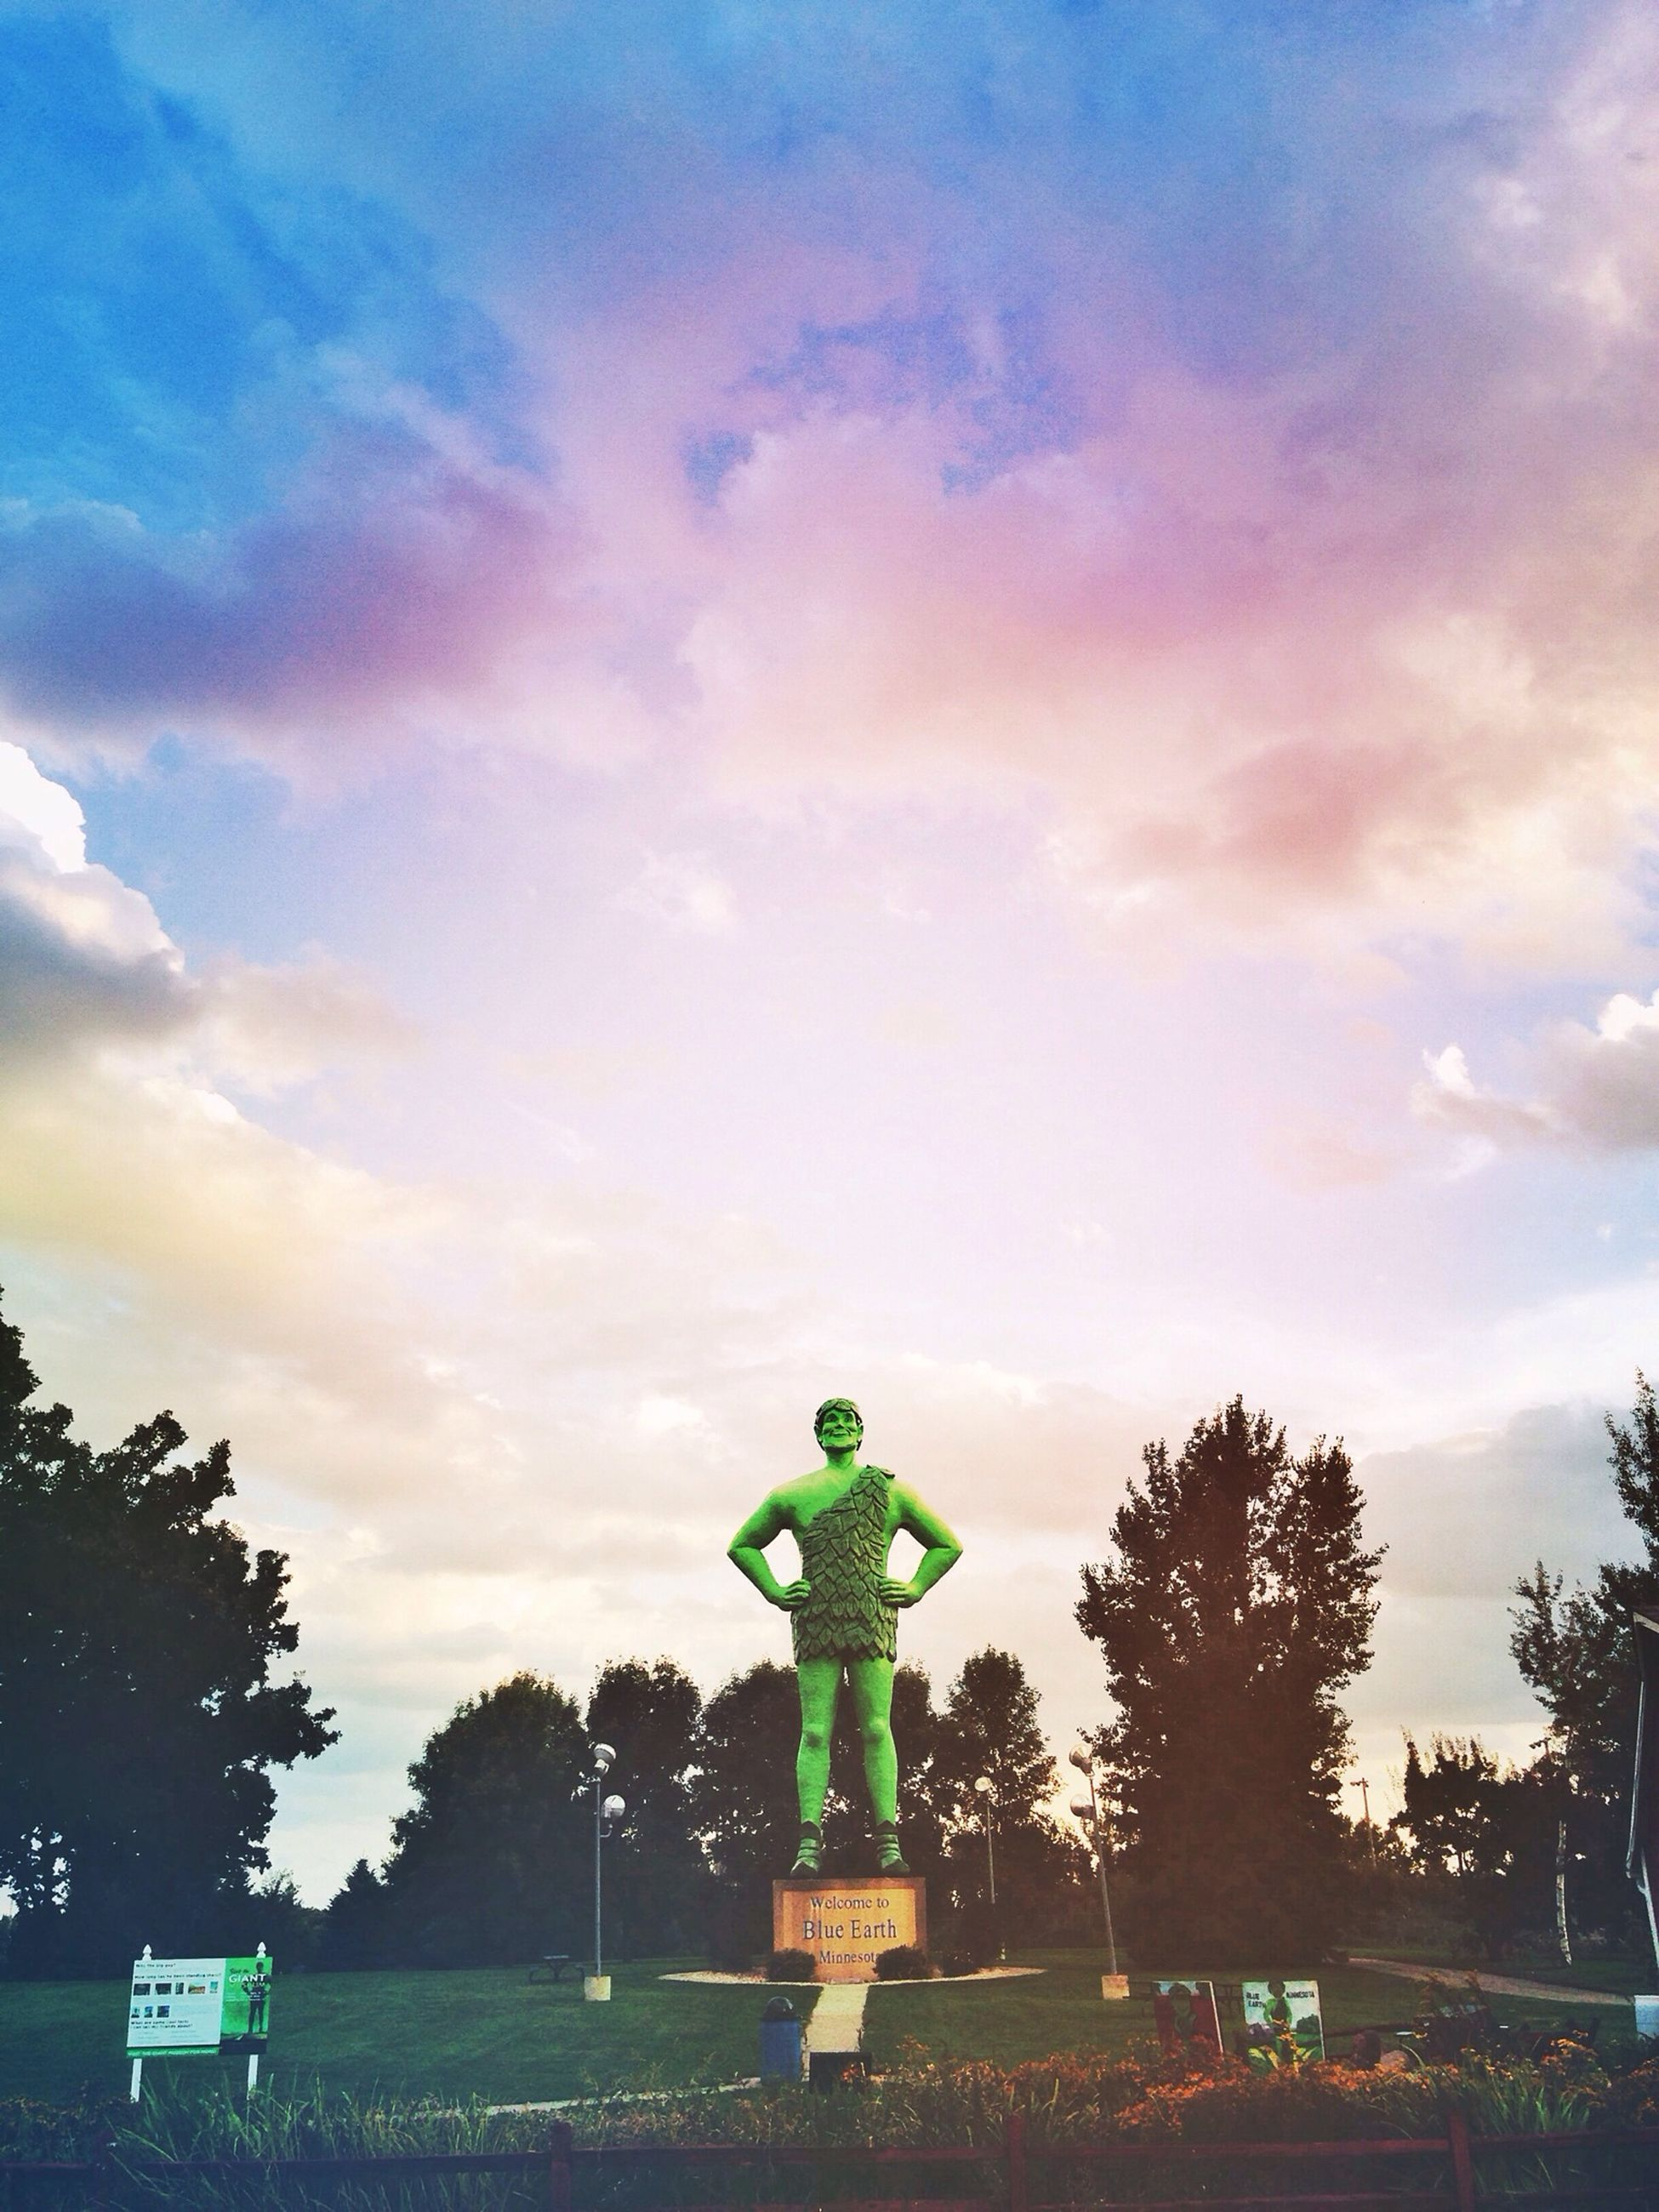 human representation, sky, art, art and craft, statue, sculpture, tree, creativity, cloud - sky, animal representation, cloudy, sunset, dusk, cloud, outdoors, land vehicle, low angle view, no people